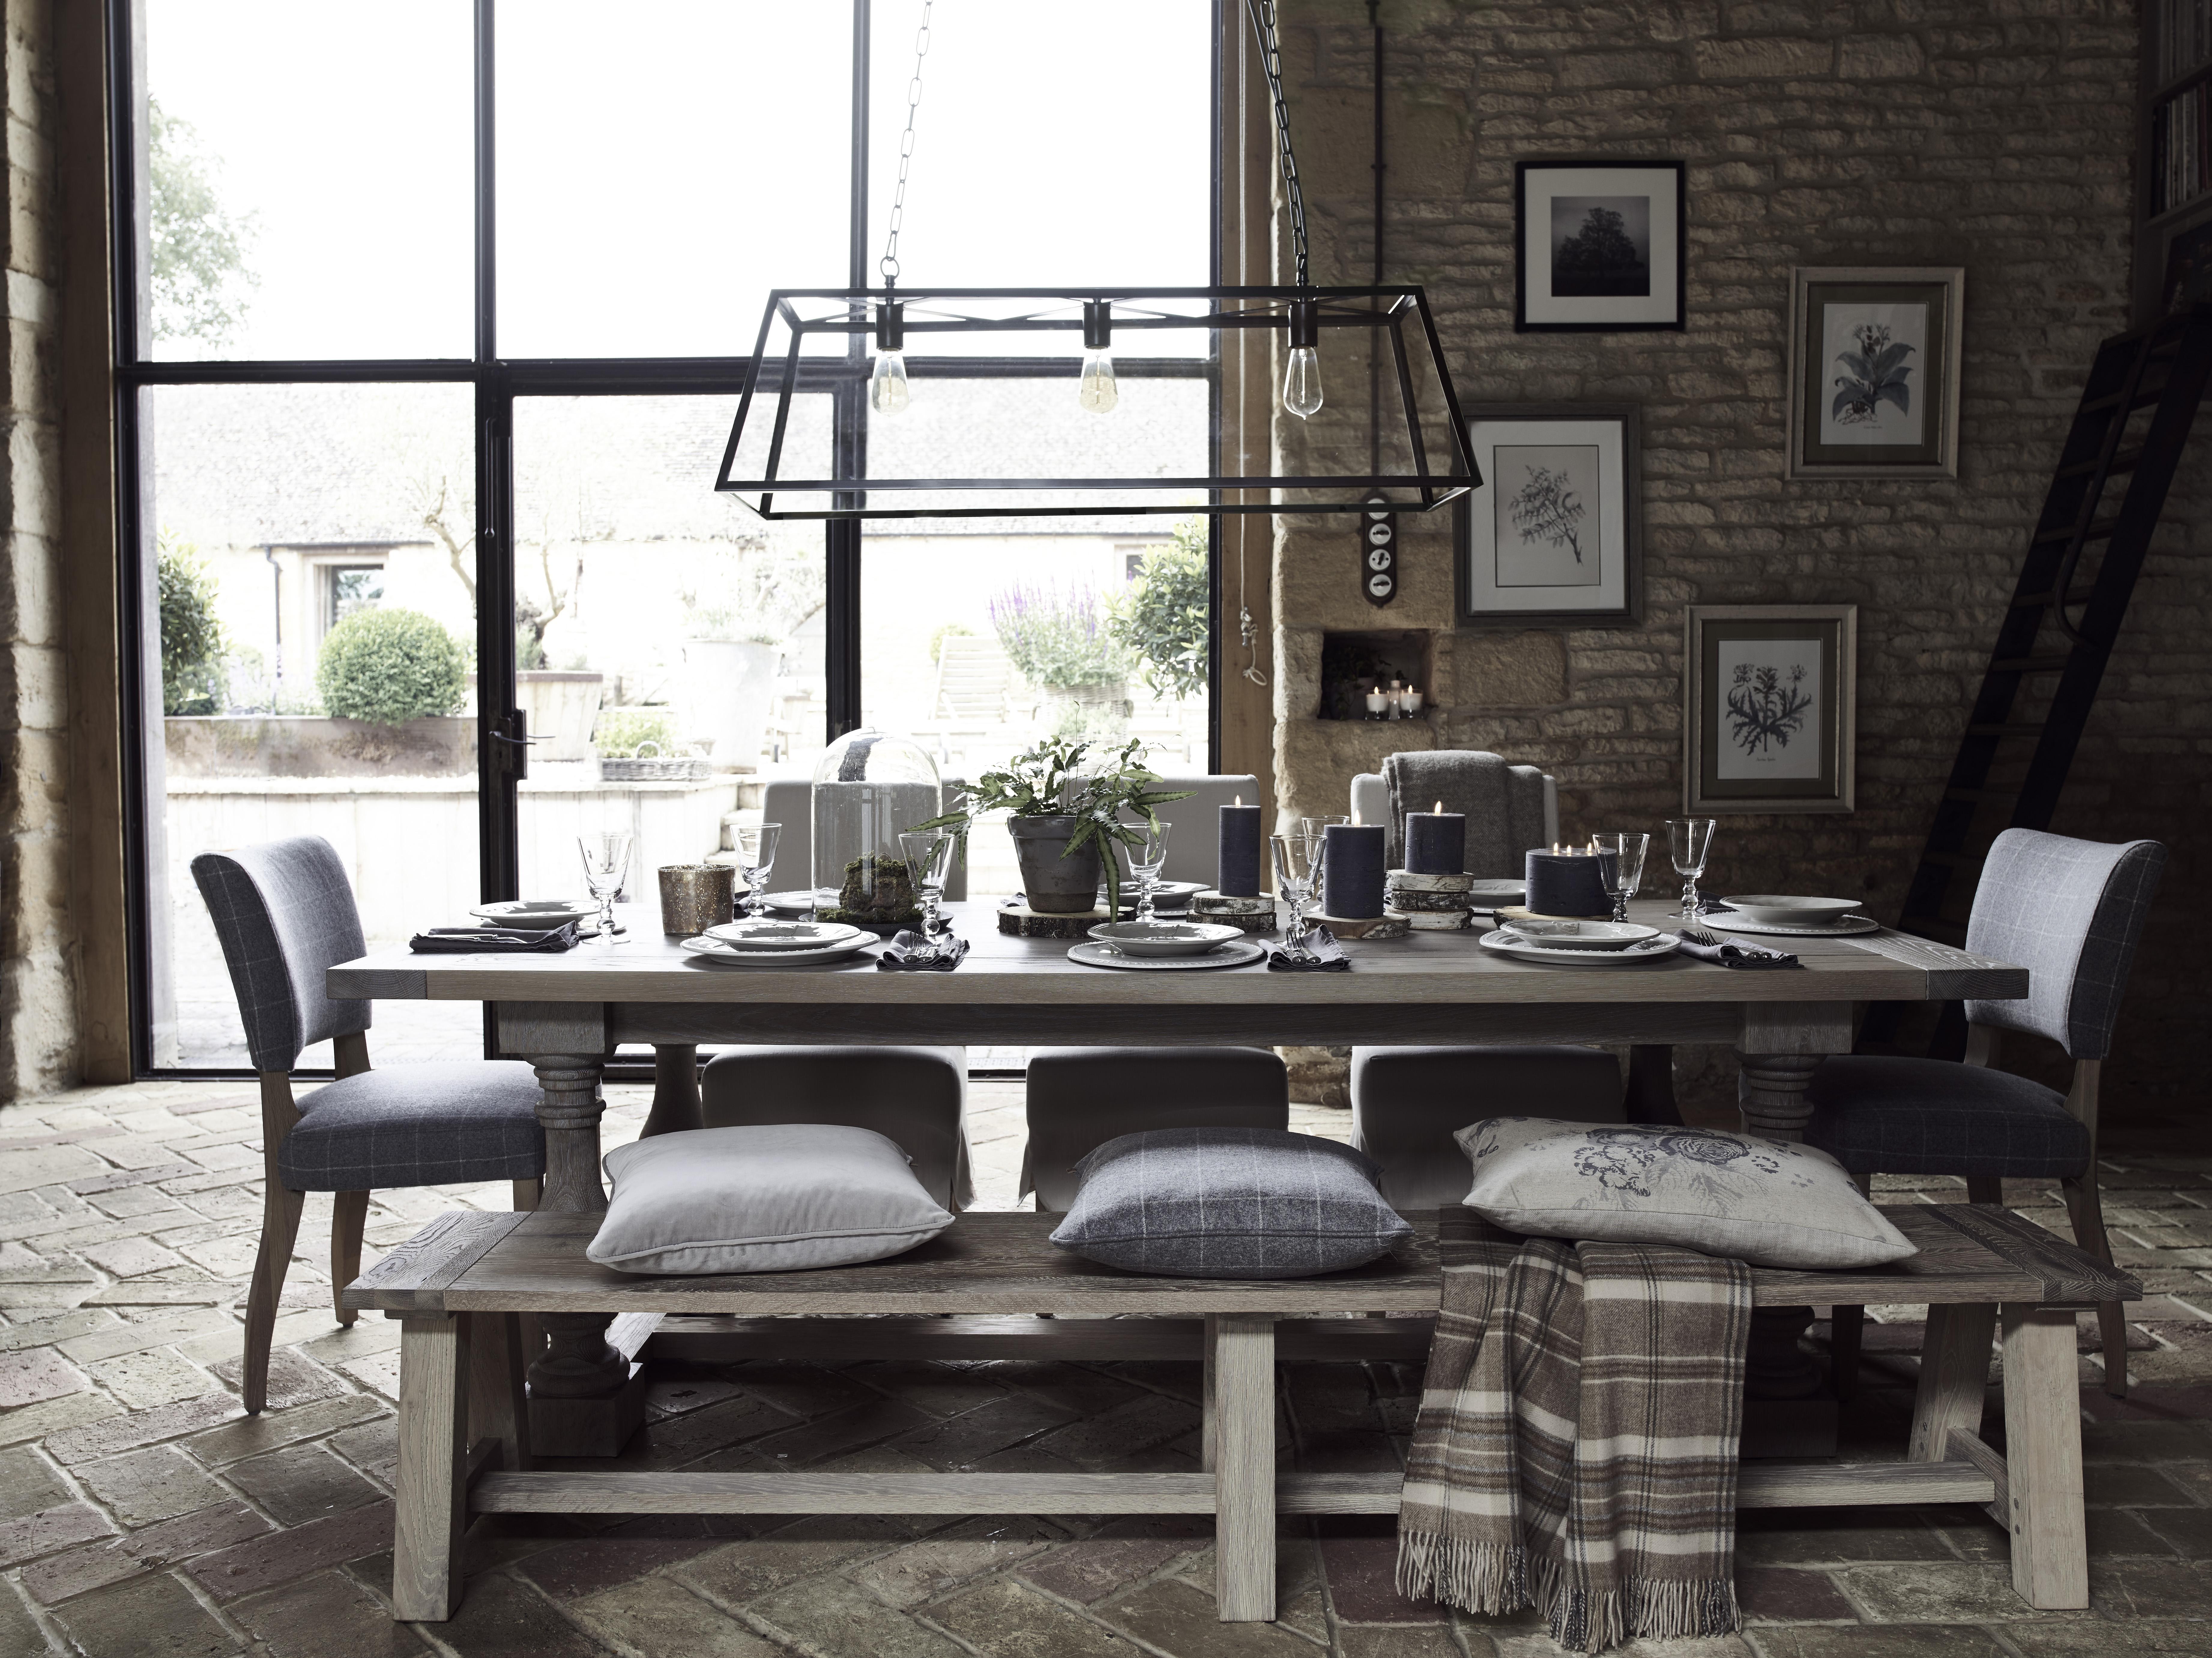 Neptune Mowbray Dining Chair Upholstered Dining